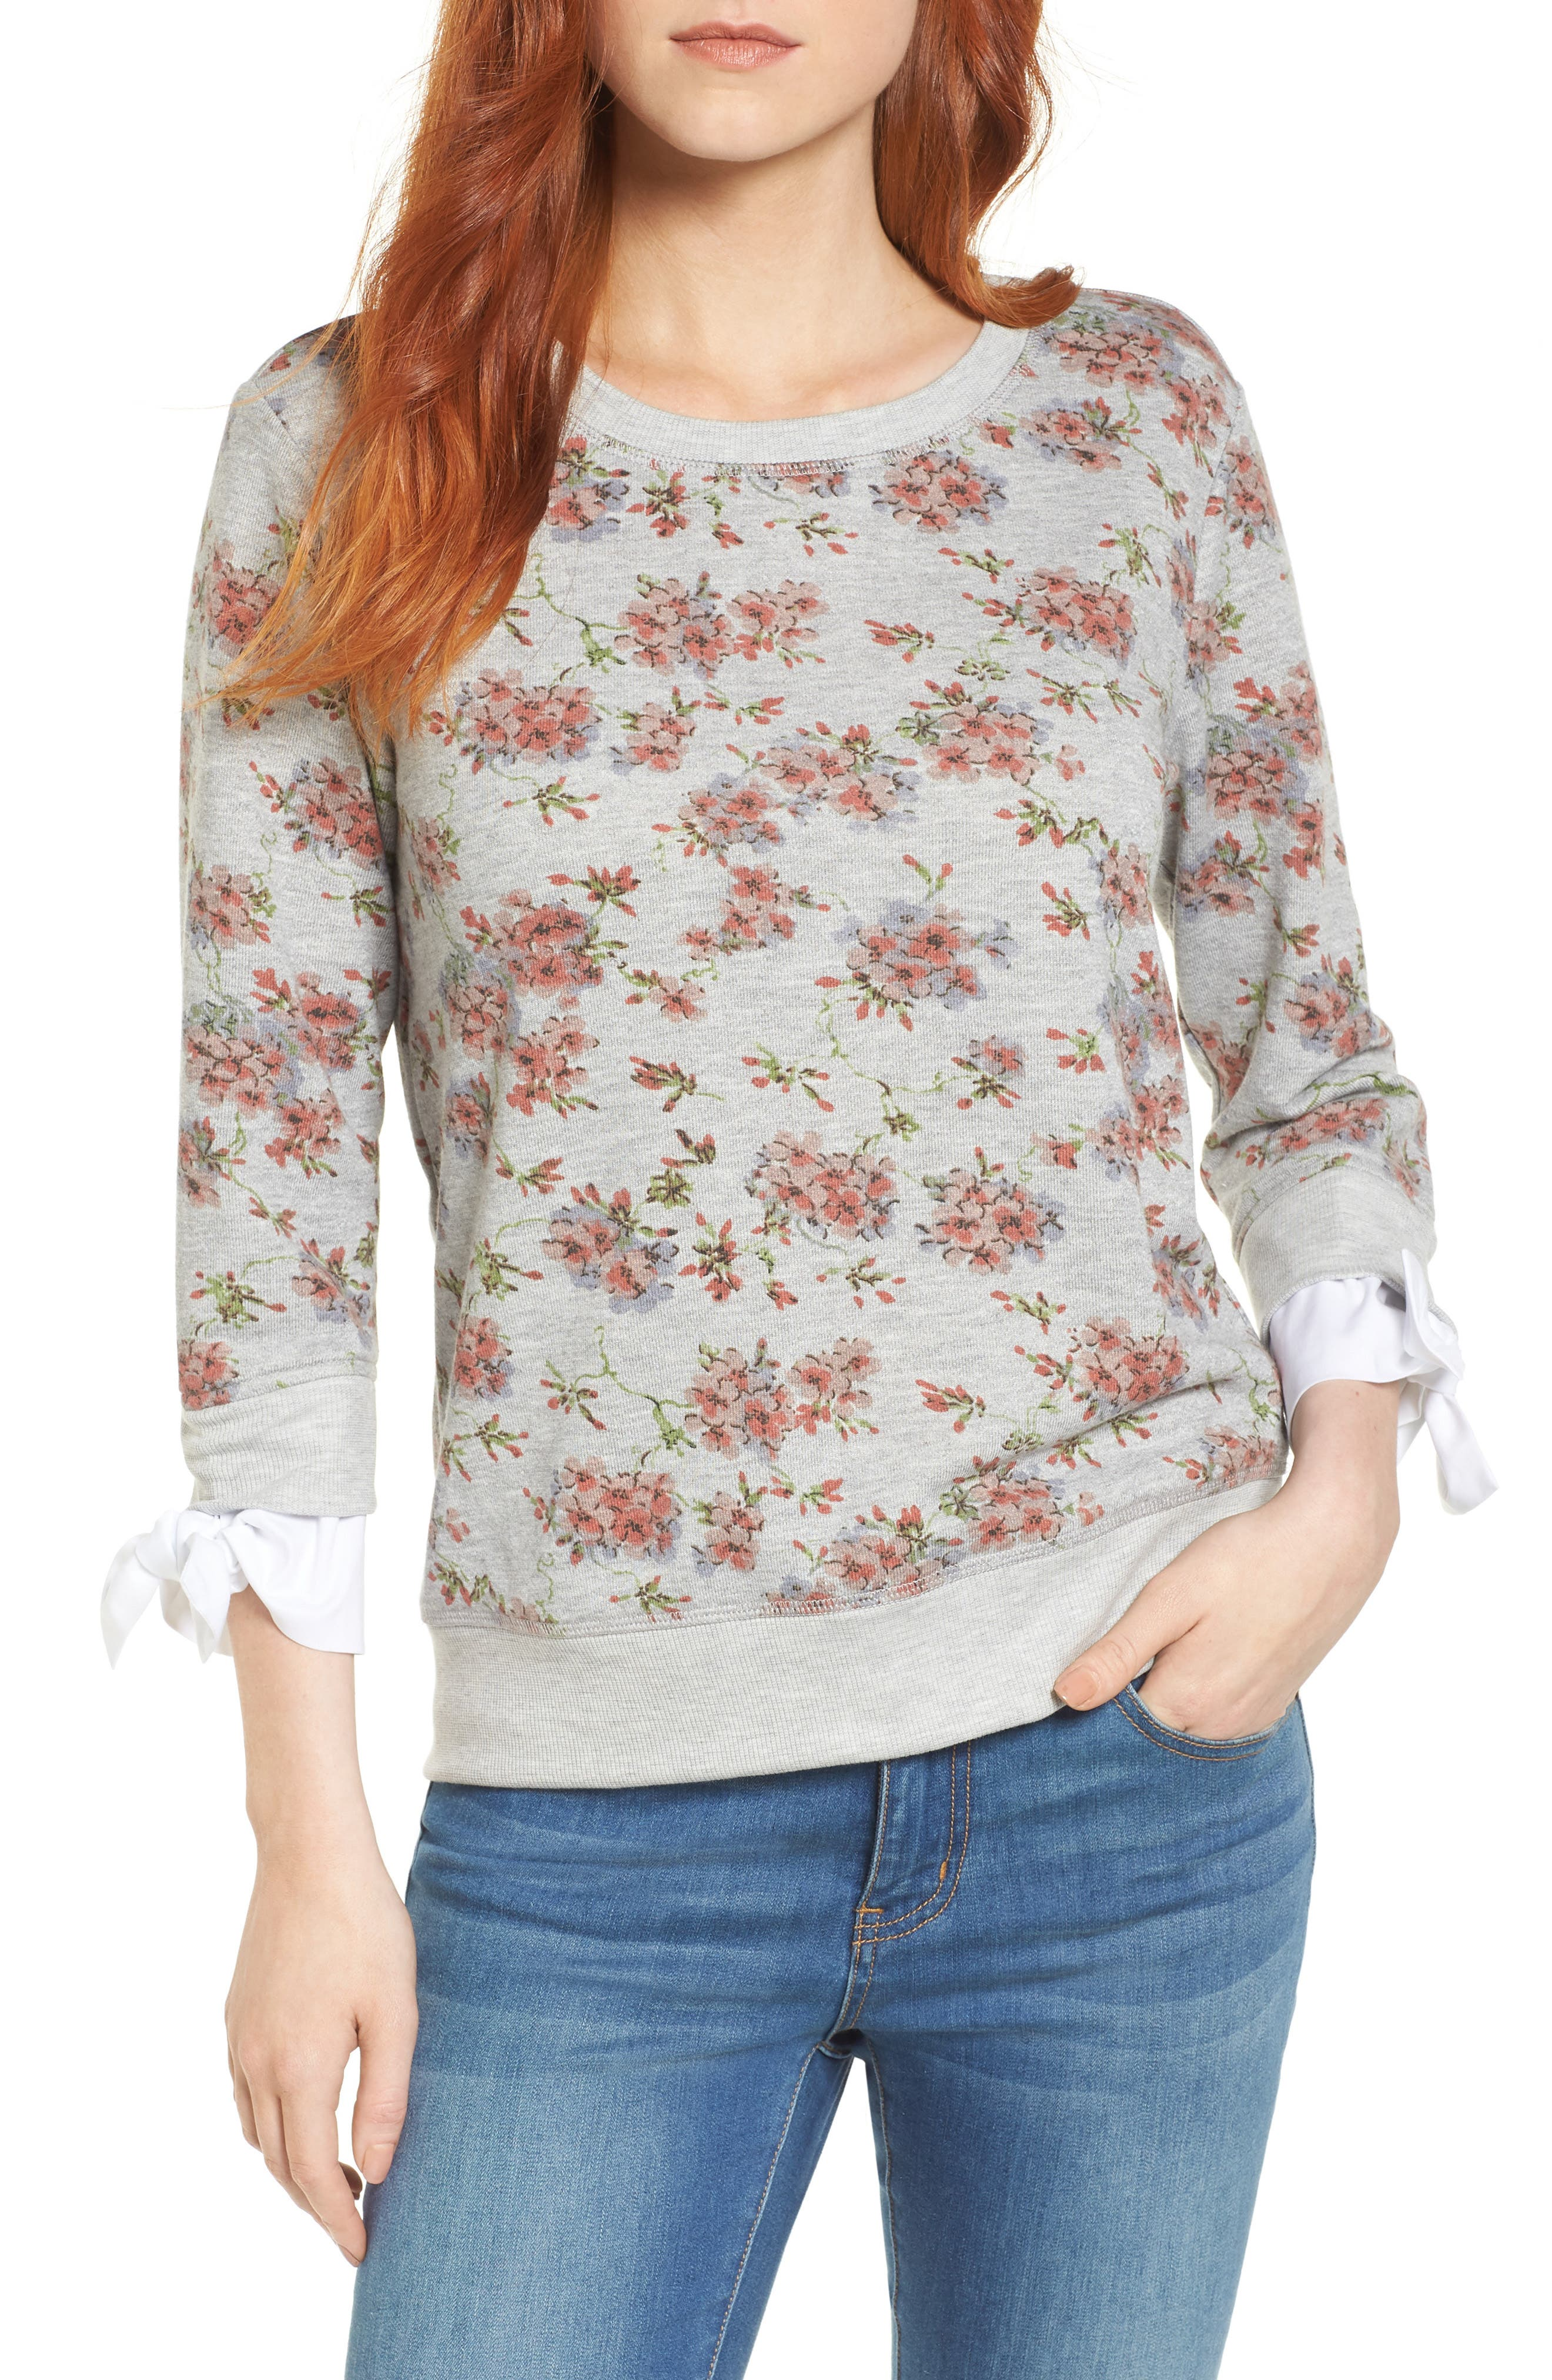 Poplin Cuff Sweatshirt,                             Main thumbnail 1, color,                             Grey Blush Floral W/ White